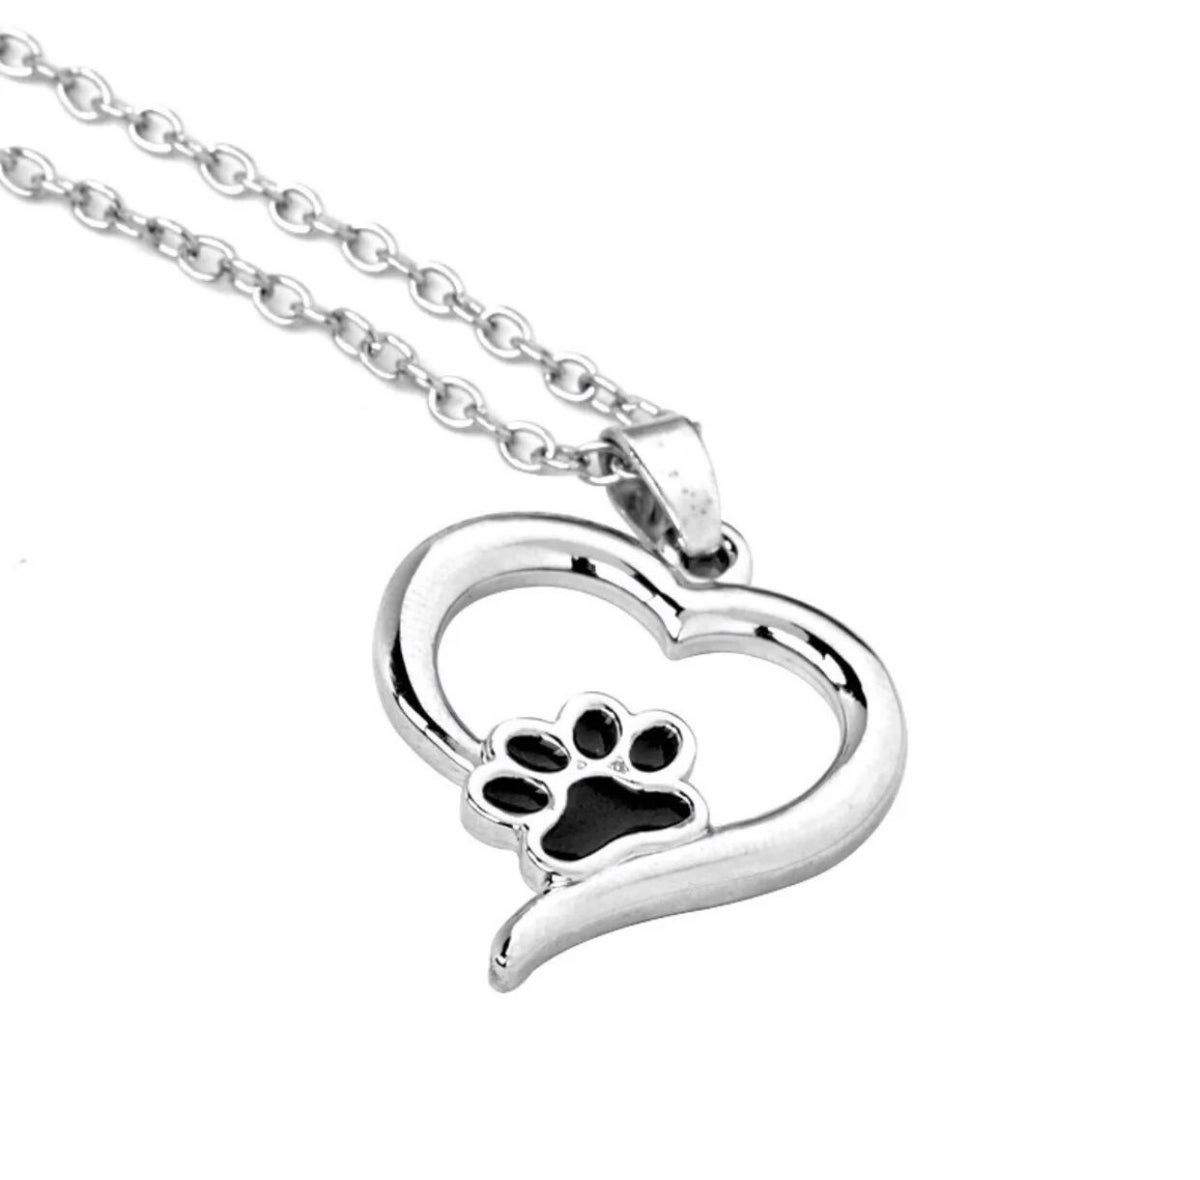 Silver Charm Cute Pet Dog Cat Paw Print Pendant Love Heart Necklace Chain Women